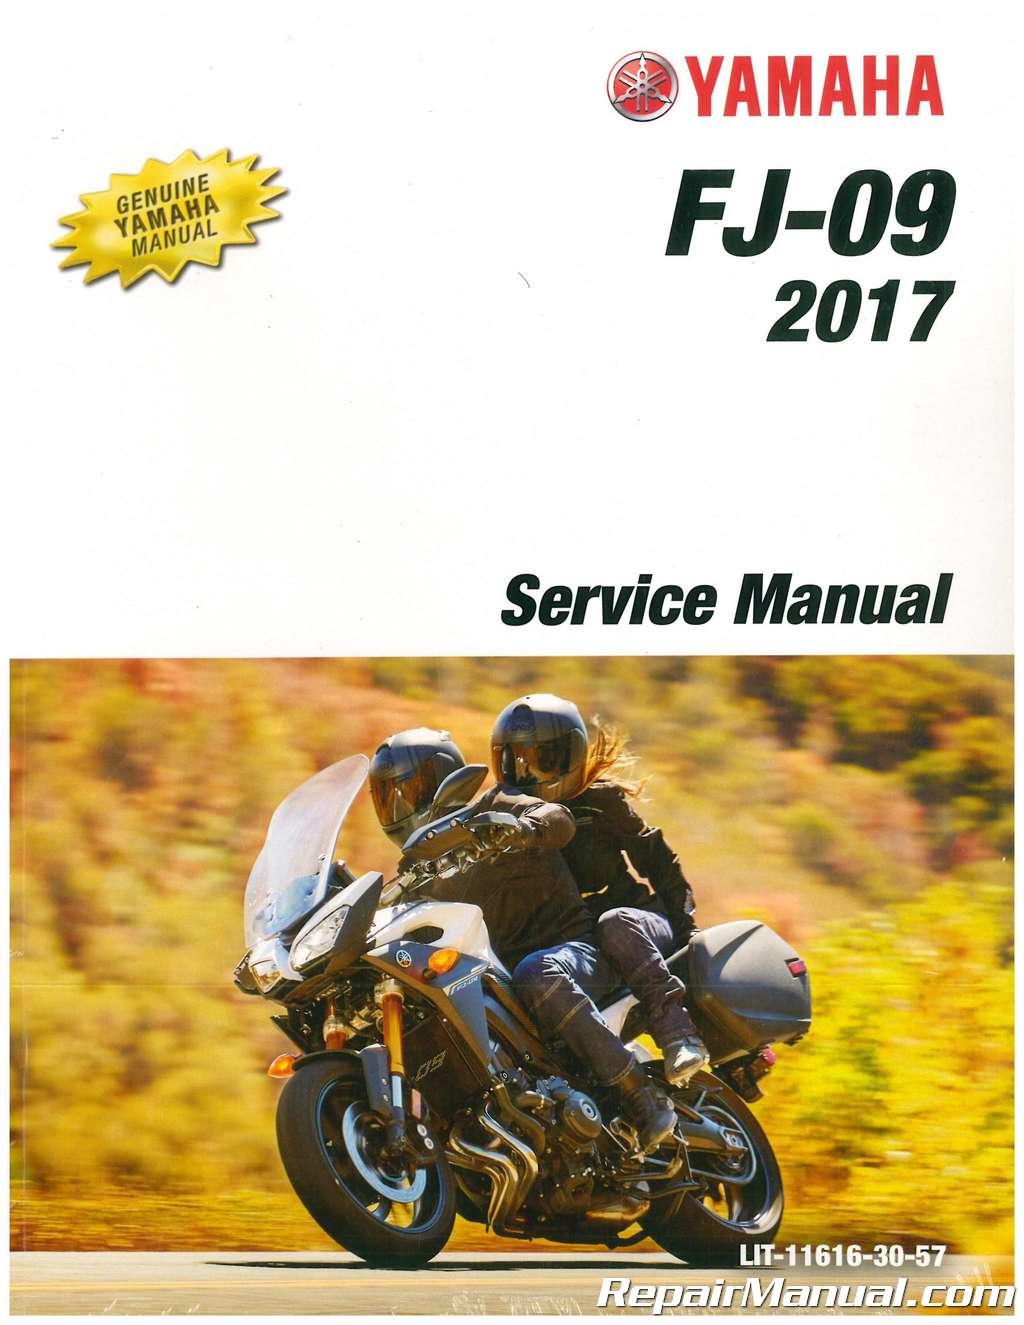 2017 yamaha fj 09 motorcycle service manual rh repairmanual com yamaha fj 1100 workshop manual Yamaha 750 Cafe Racer